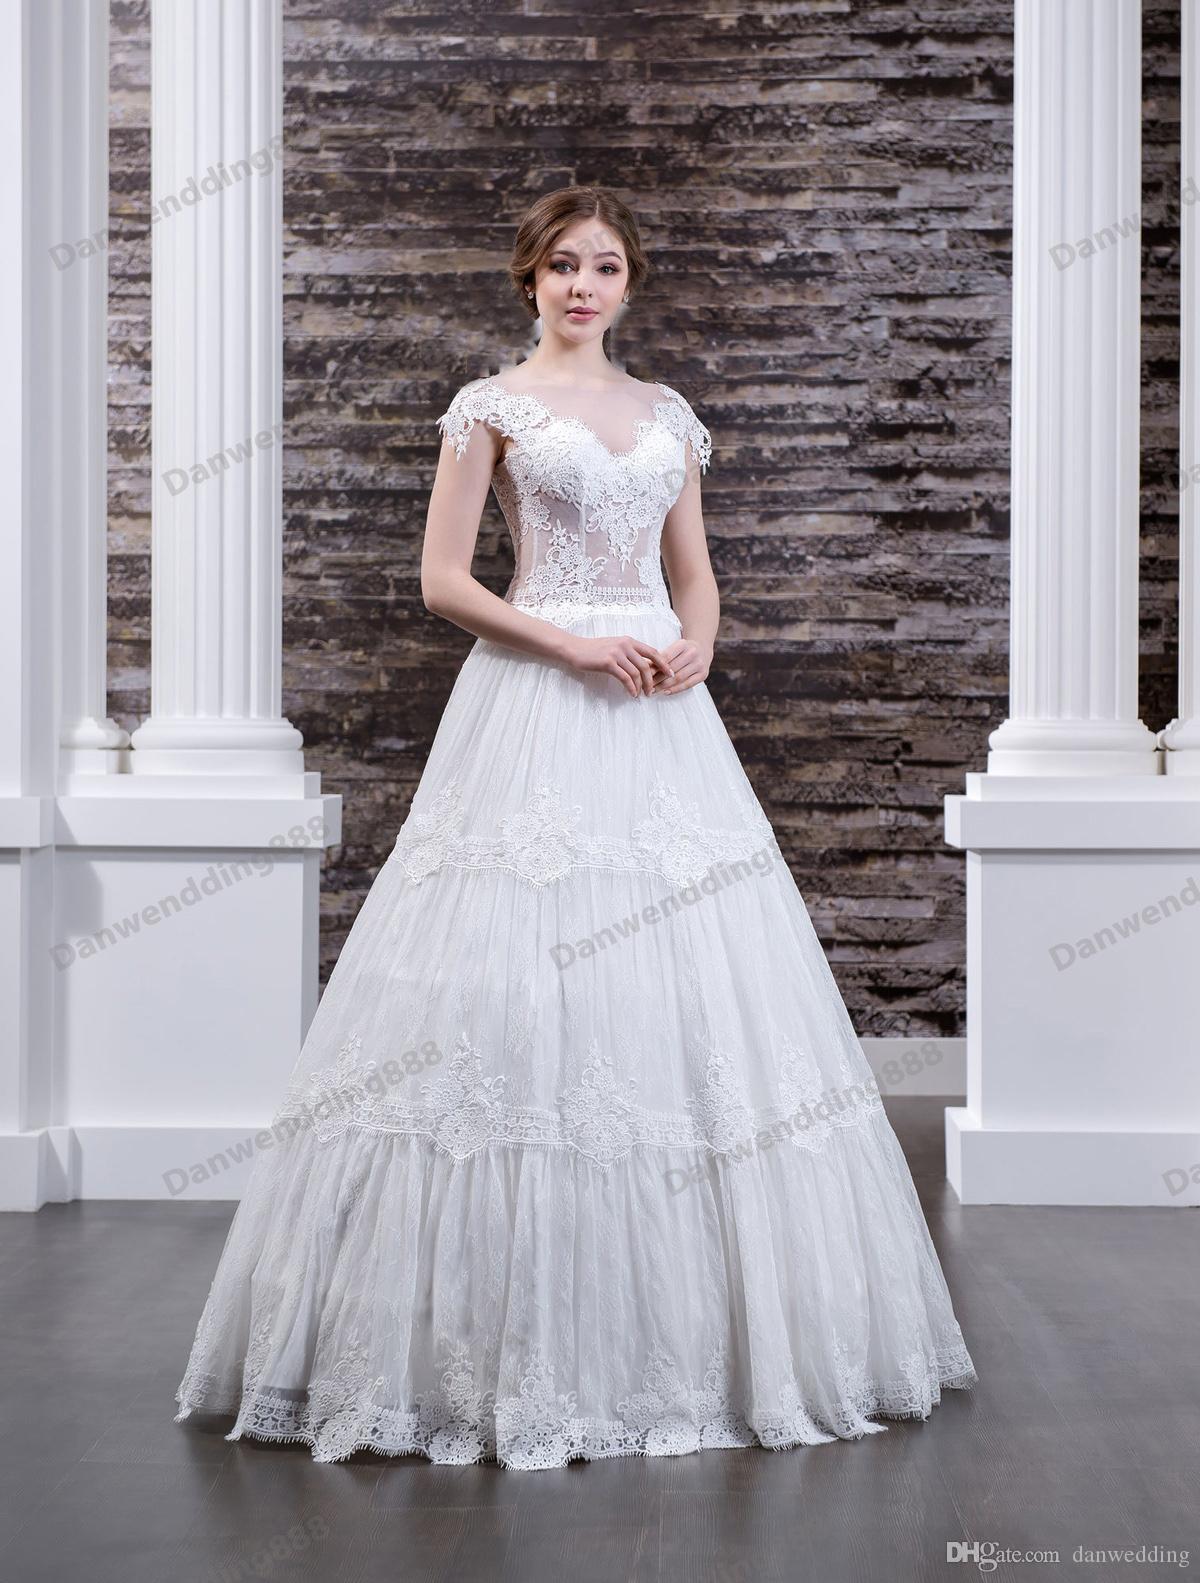 Sexy White Lace/Tulle Scoop Applique A-Line Wedding Dresses Bridal Pageant Dresses Wedding Attire Dresses Custom Size 2-16 ZW608072